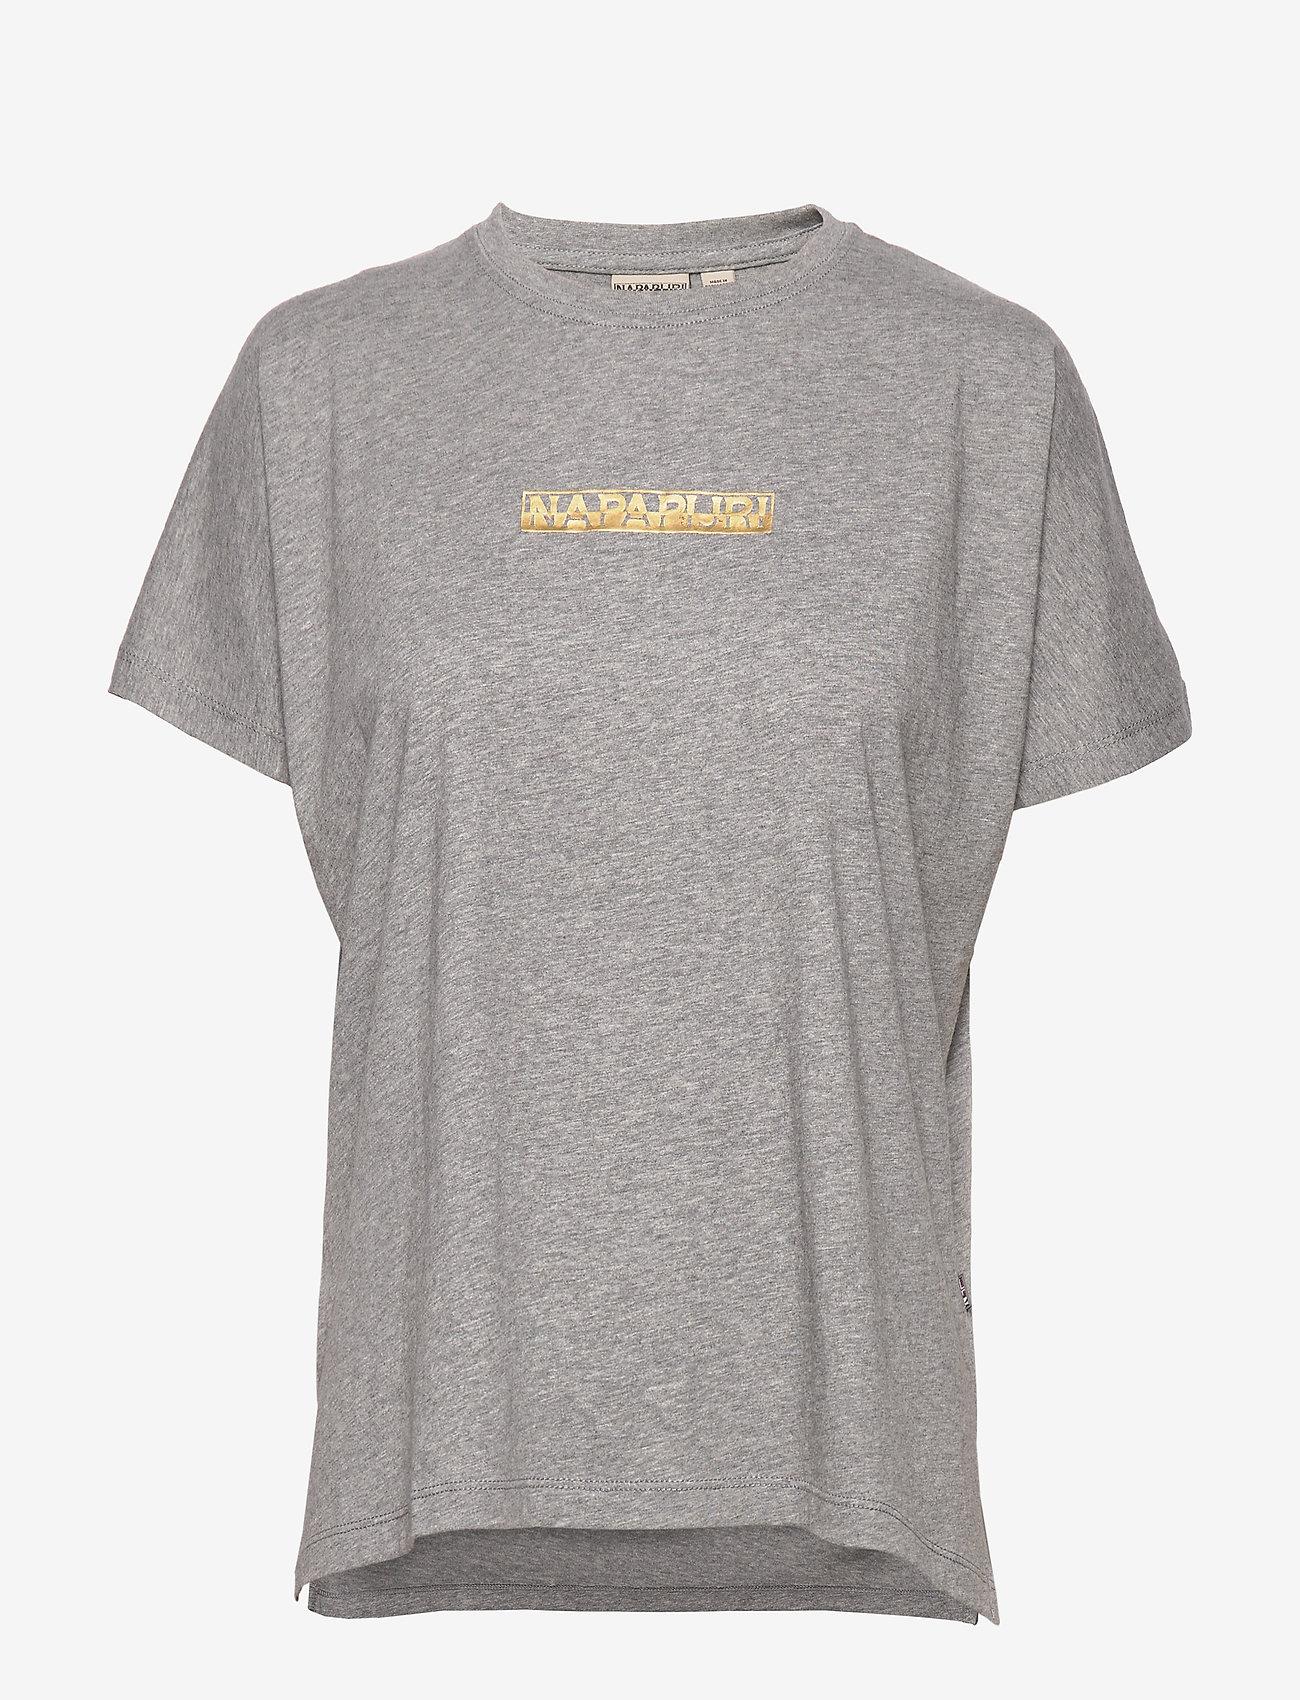 Napapijri - SIONE - t-shirts - grey melange - 0